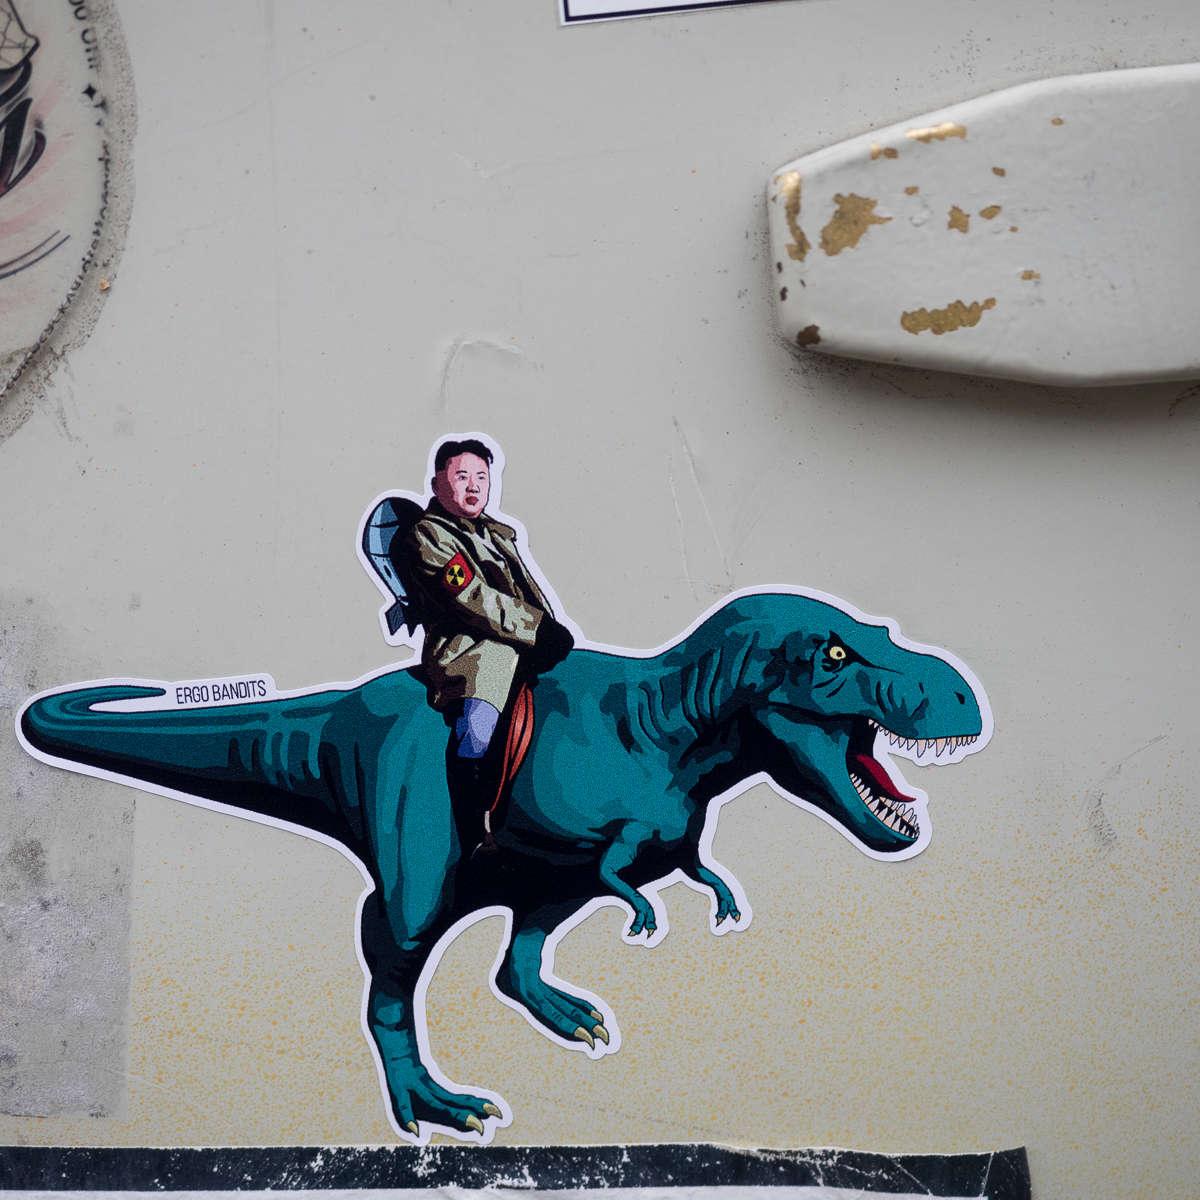 Streetart in Frankfurt - Ergo Bandits